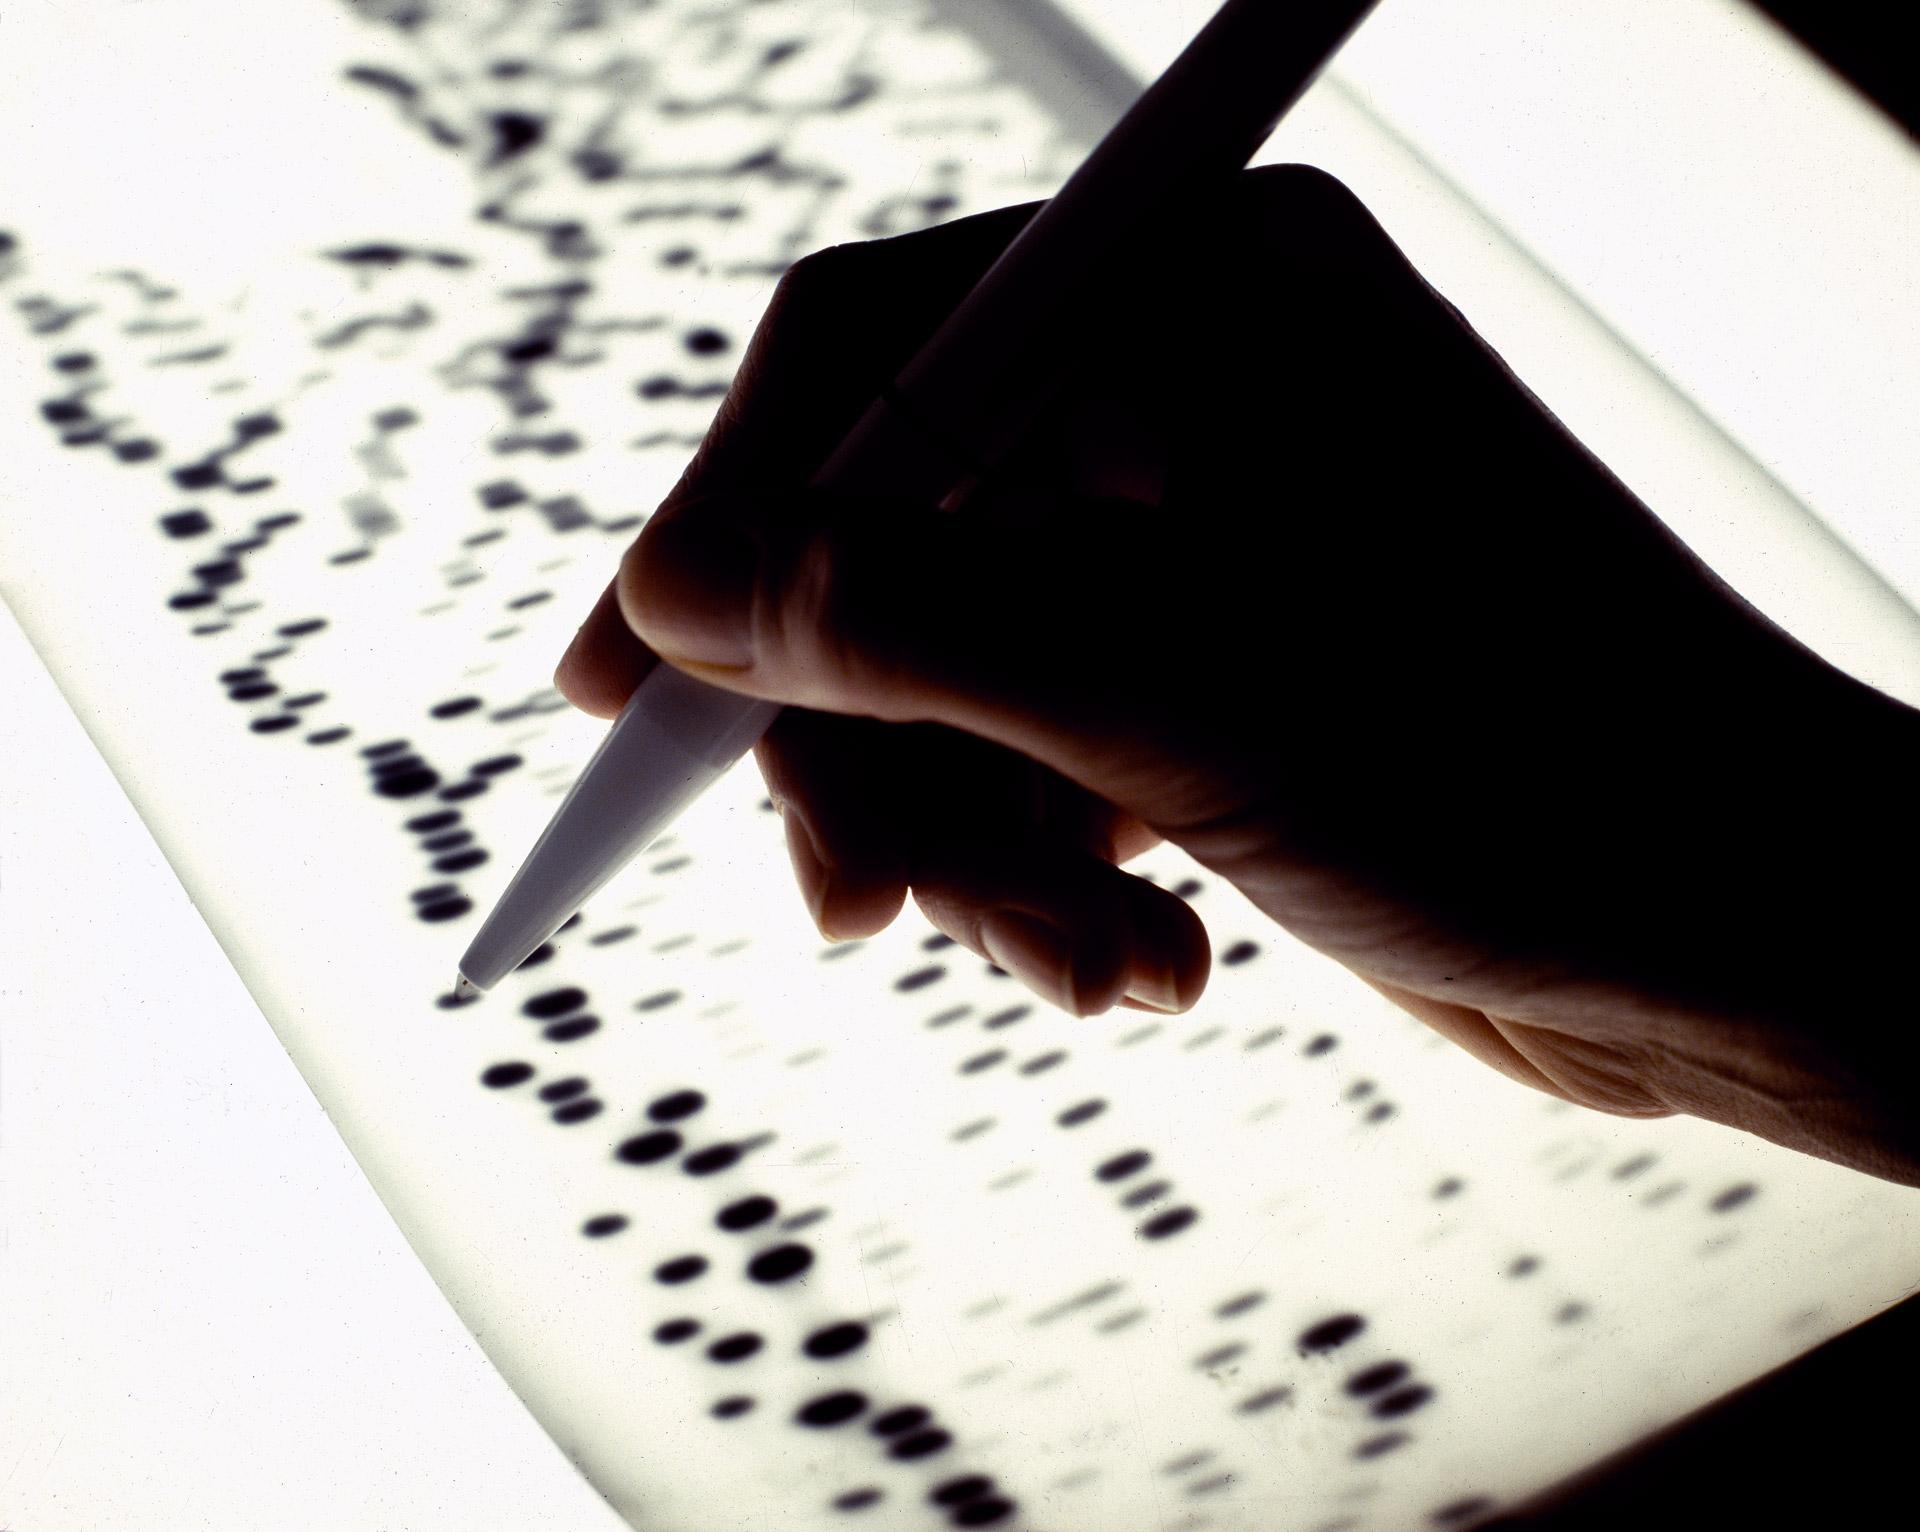 A laboratory worker is segmenting genes at Novo Nordisk